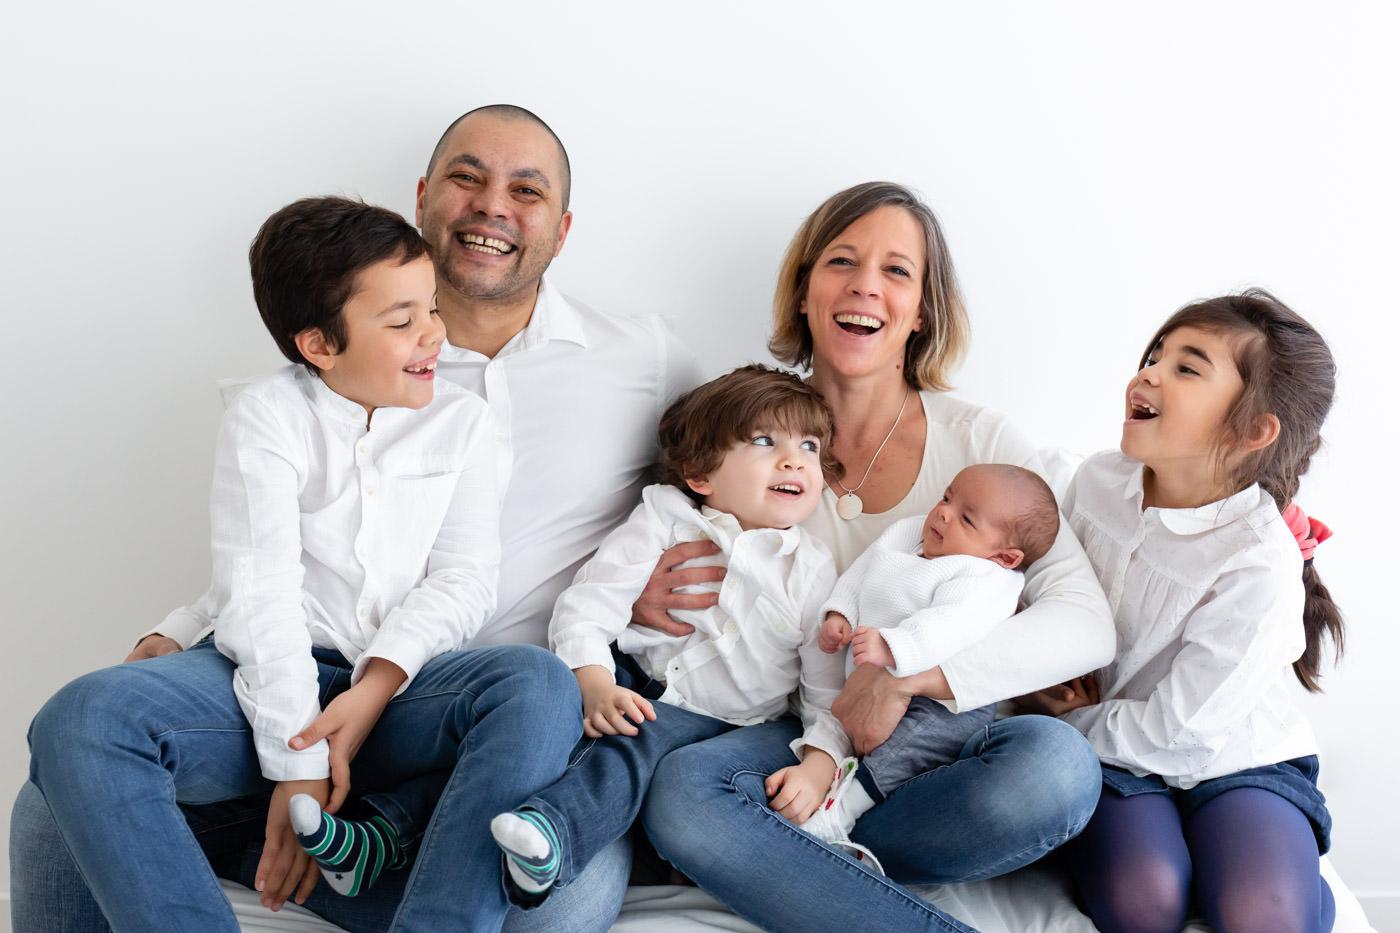 photographe metz famille